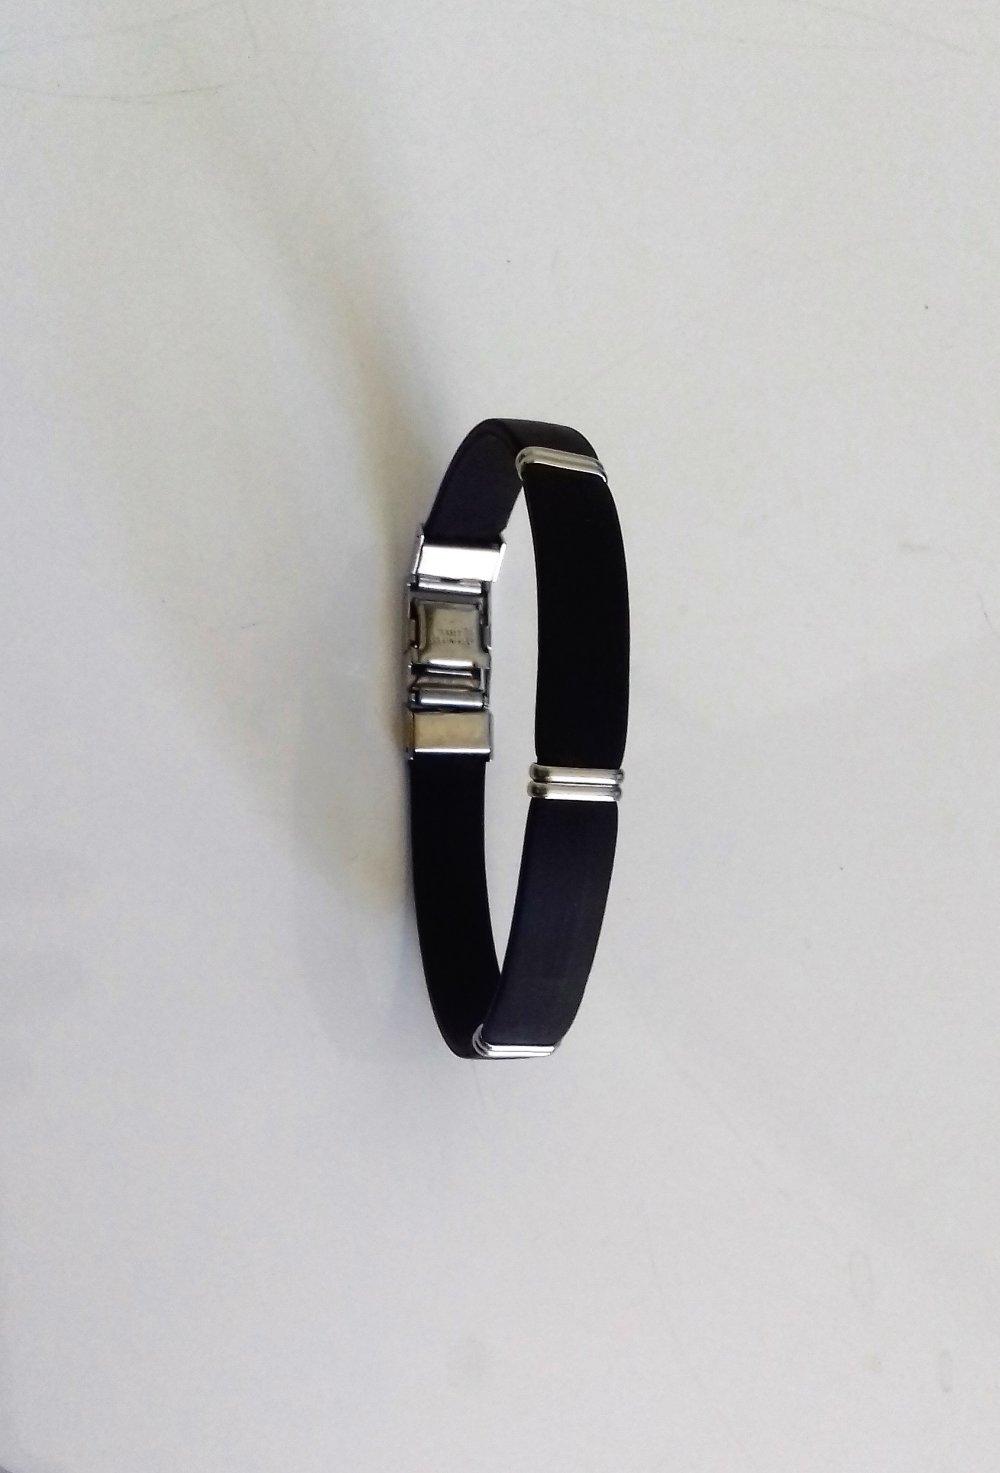 Bracelet silicone acier